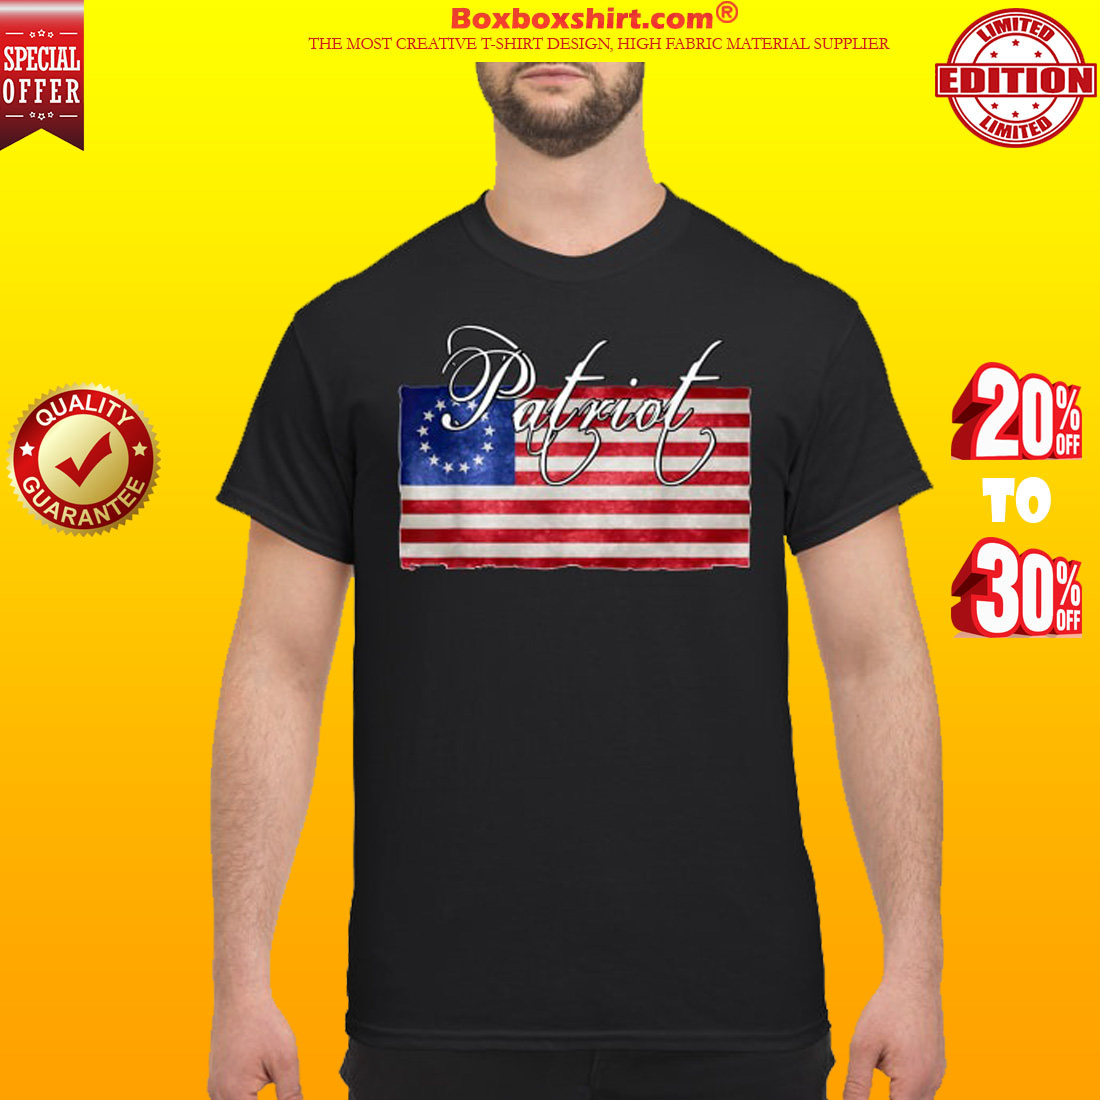 American betsy ross flag Patriot classic shirt